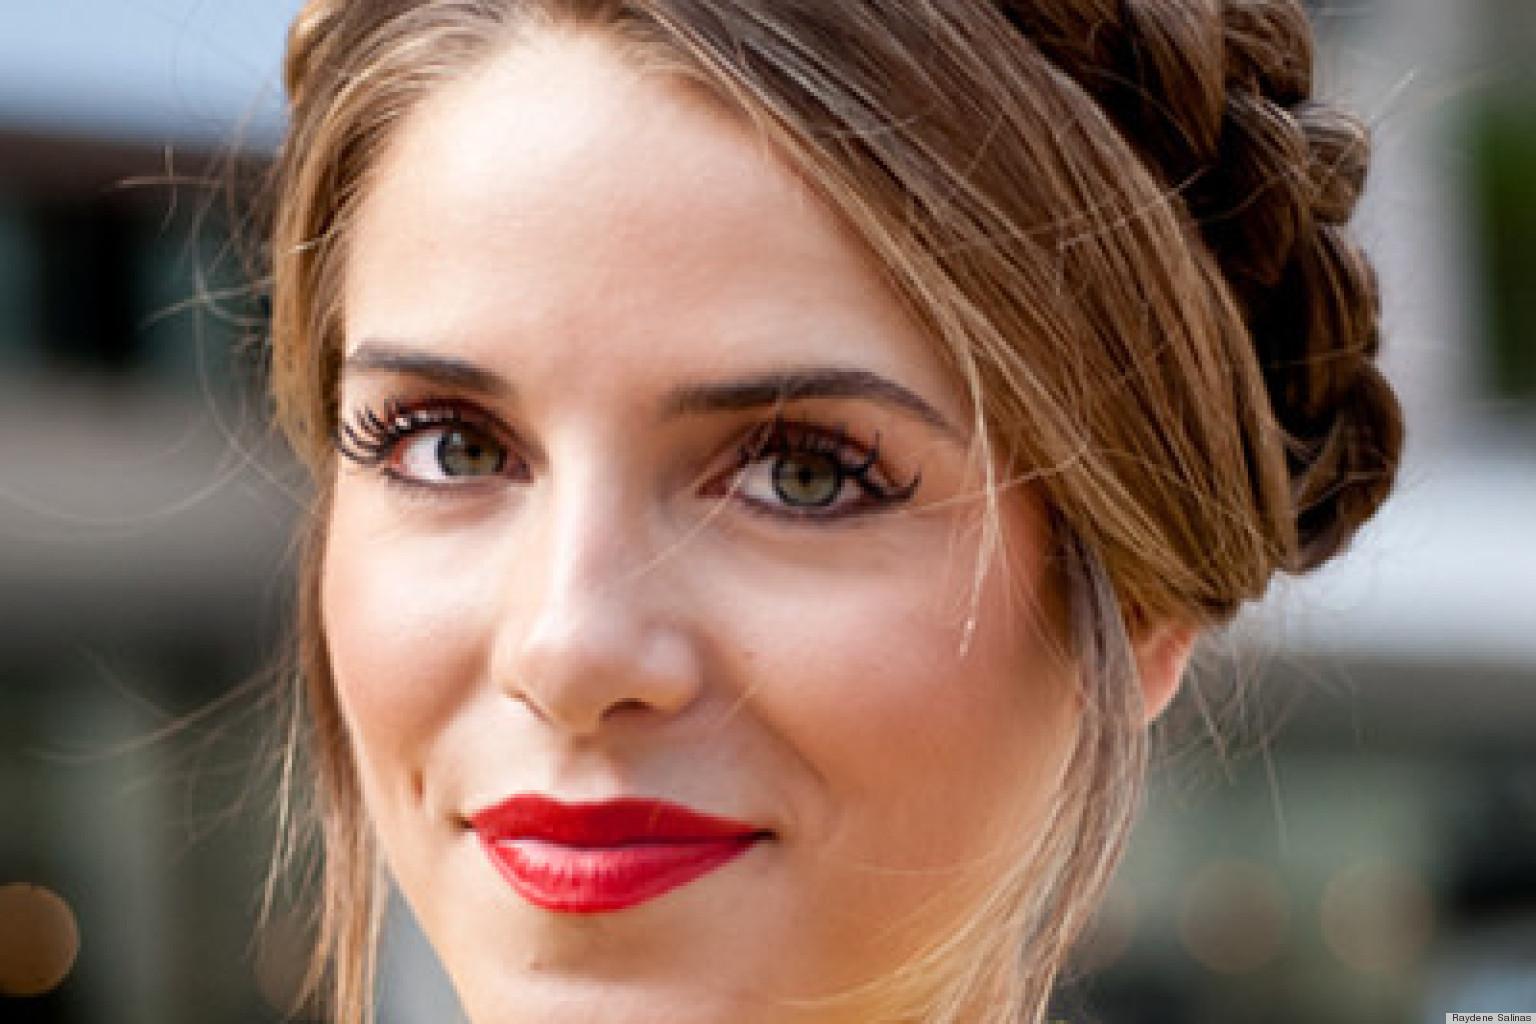 Beauty Street Style: Julia Engel, Style Blogger, Shares